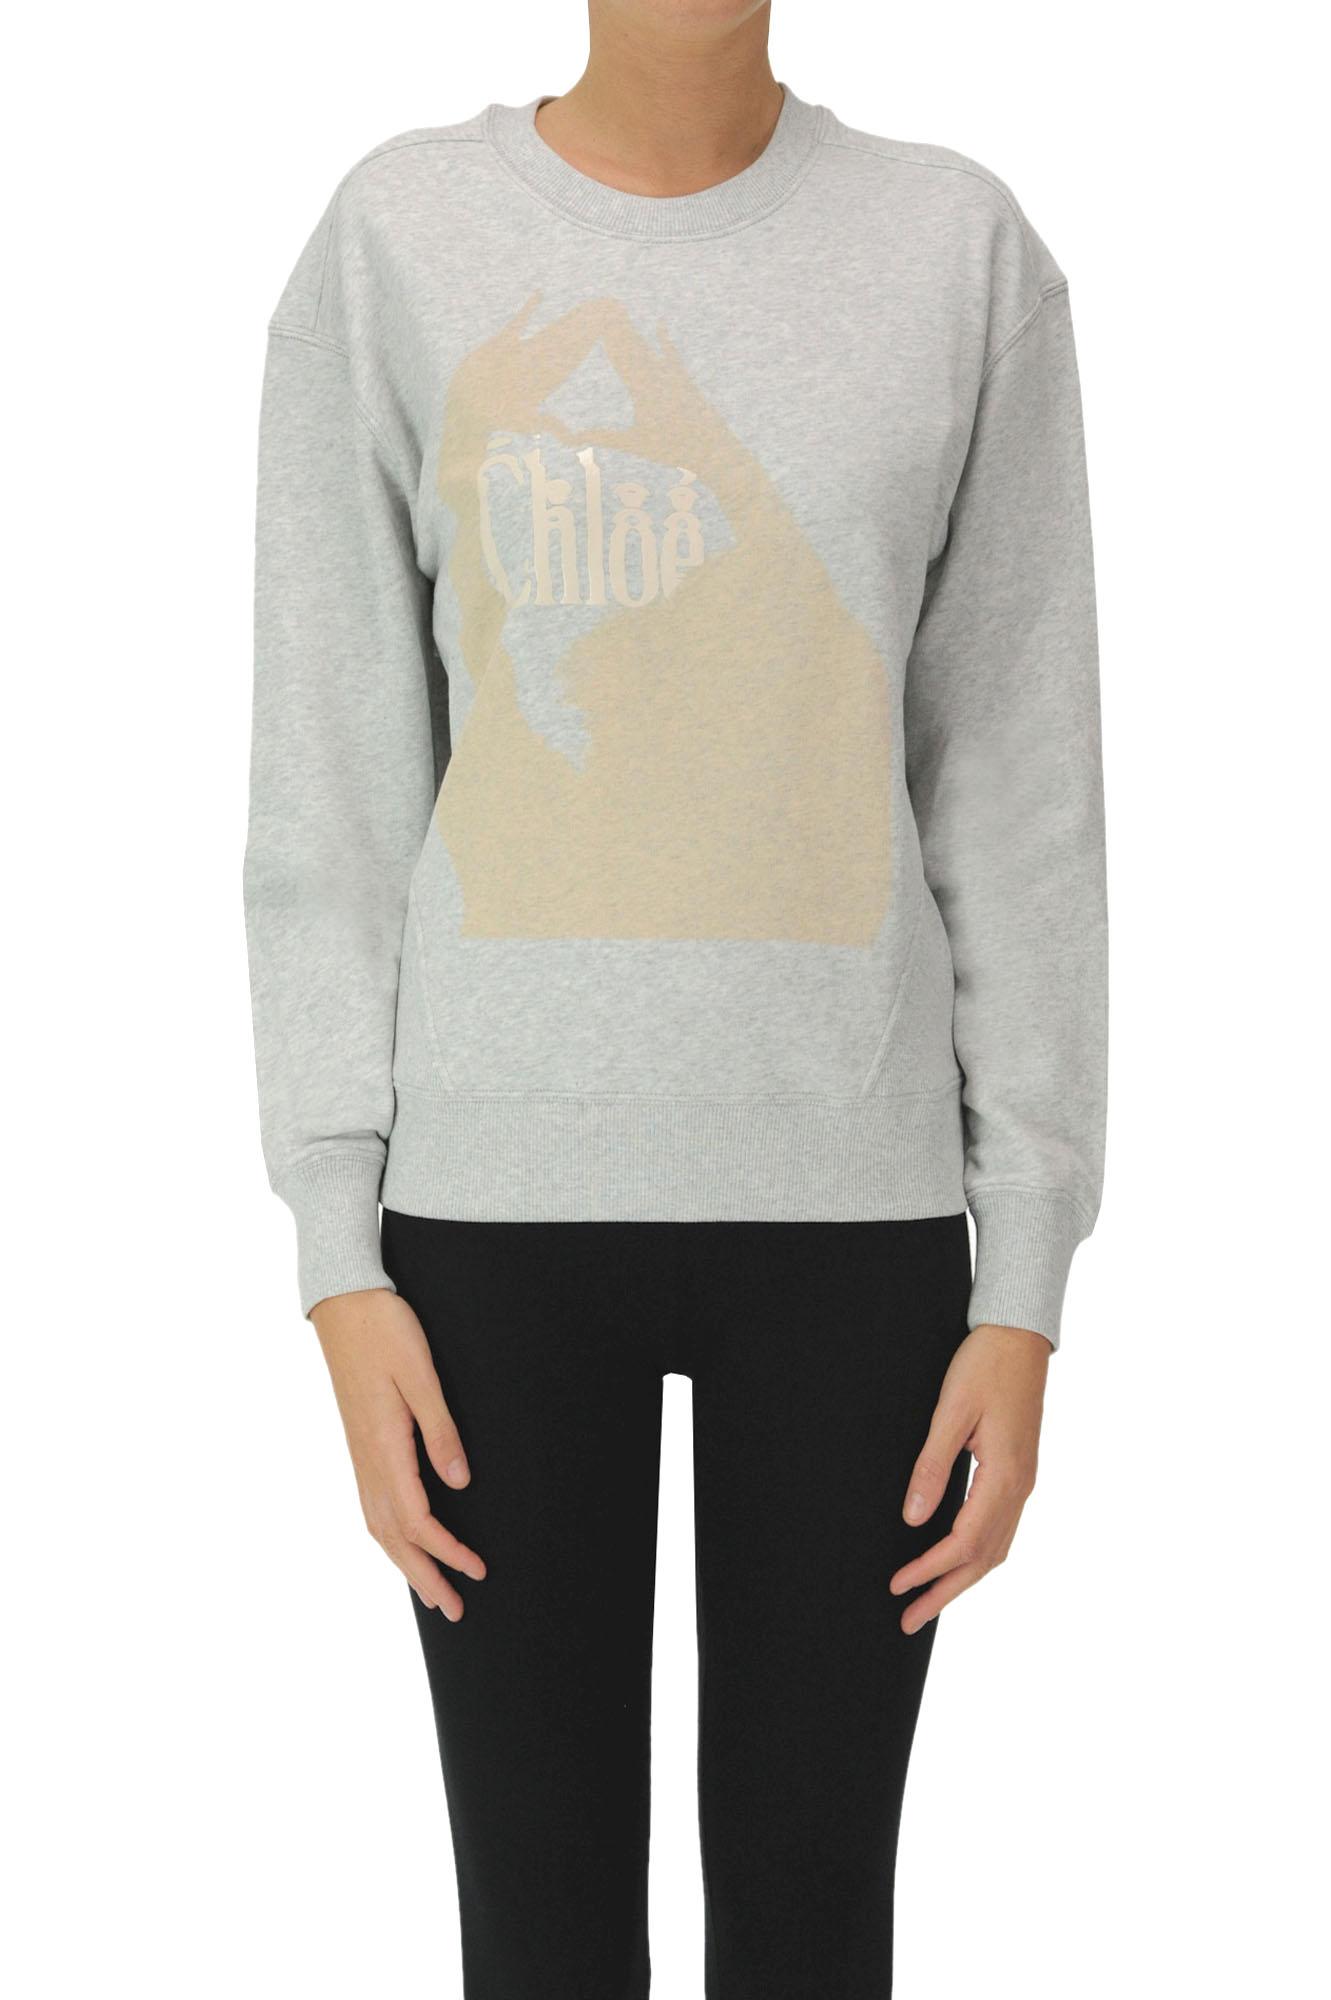 Chloé Designer Logo Sweatshirt In Grey